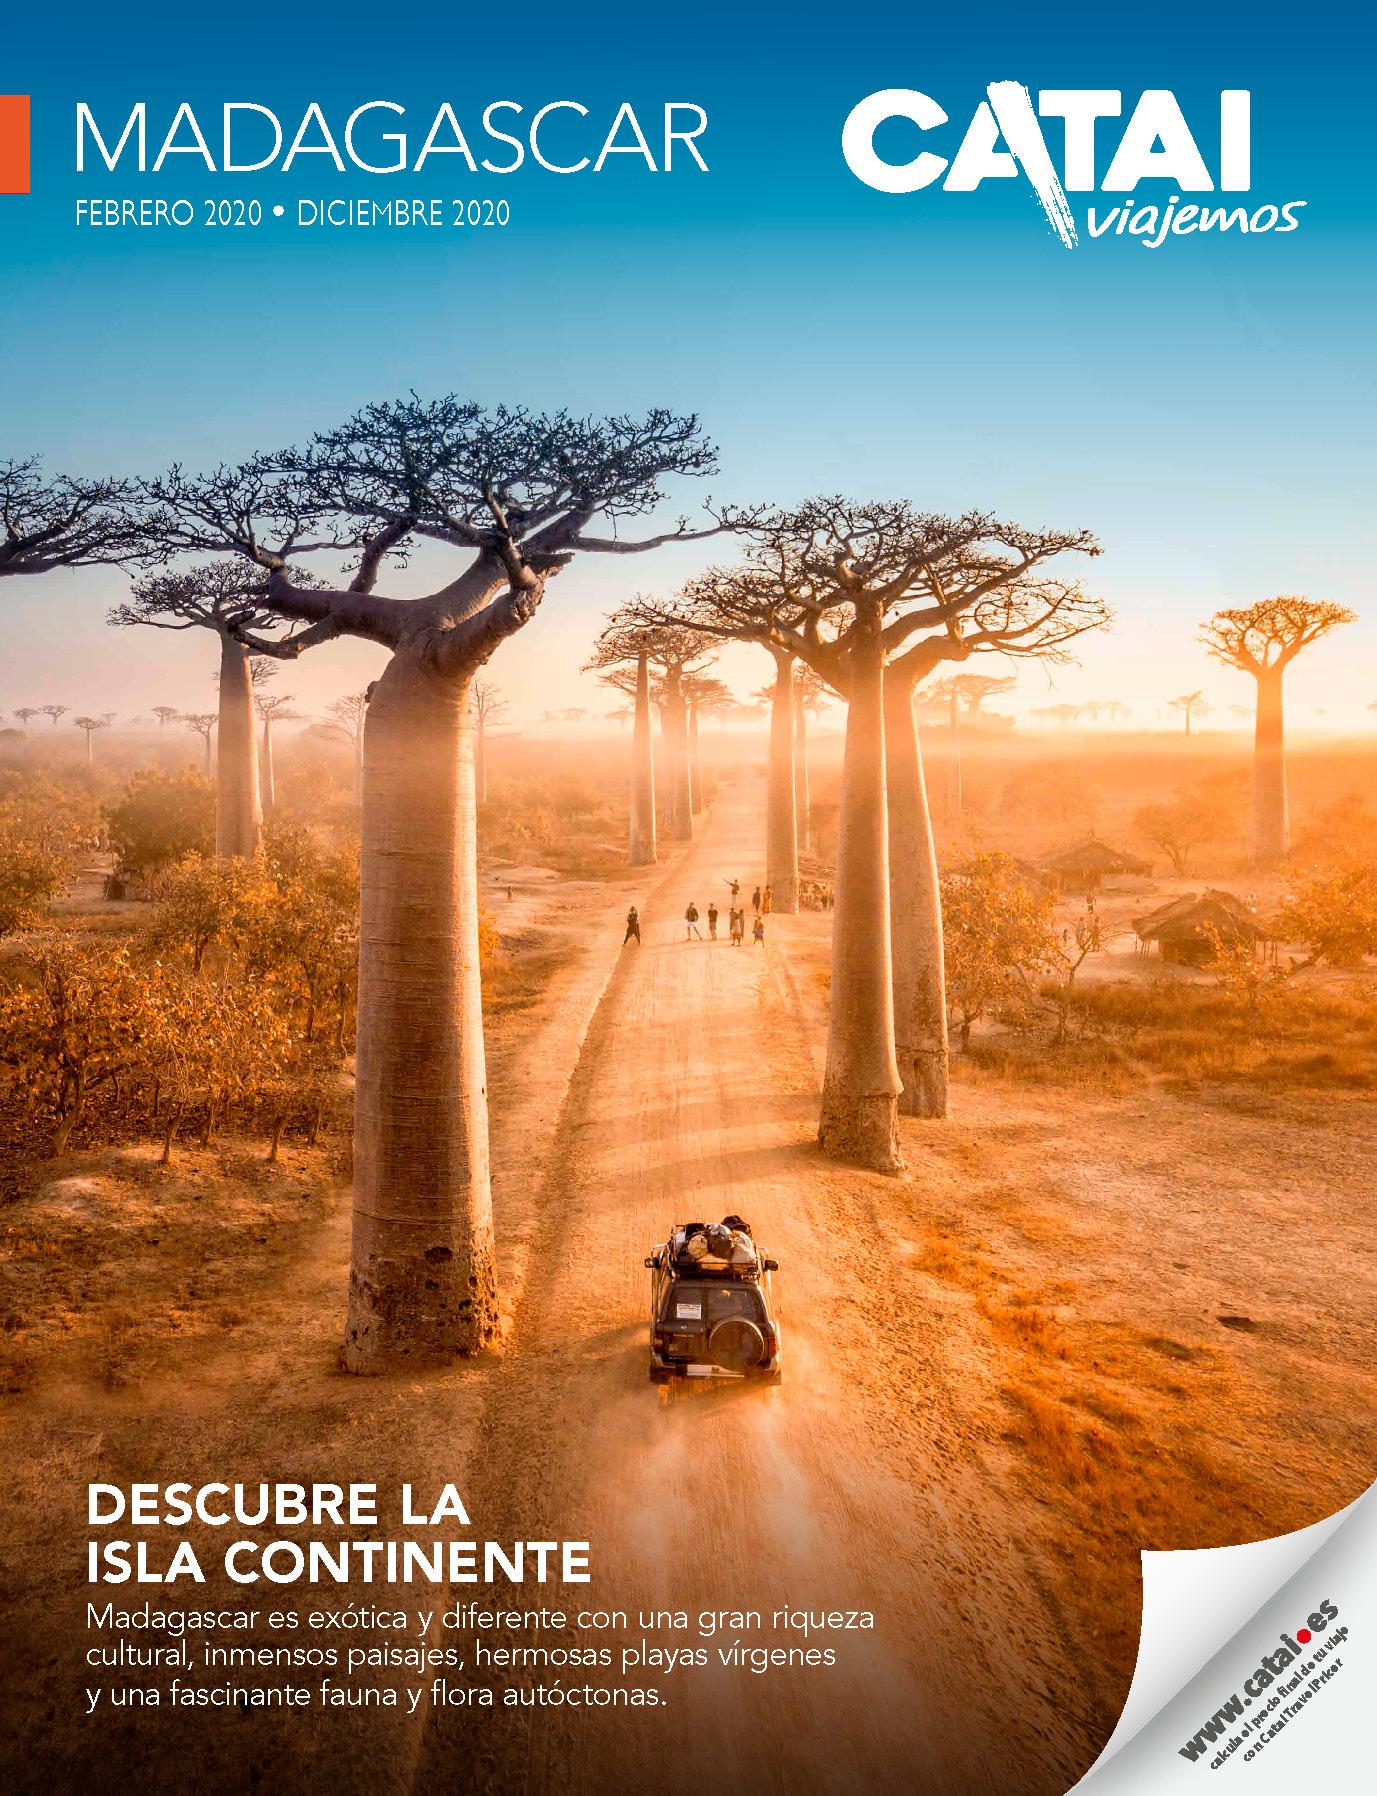 Catalogo Catai Madagascar 2020